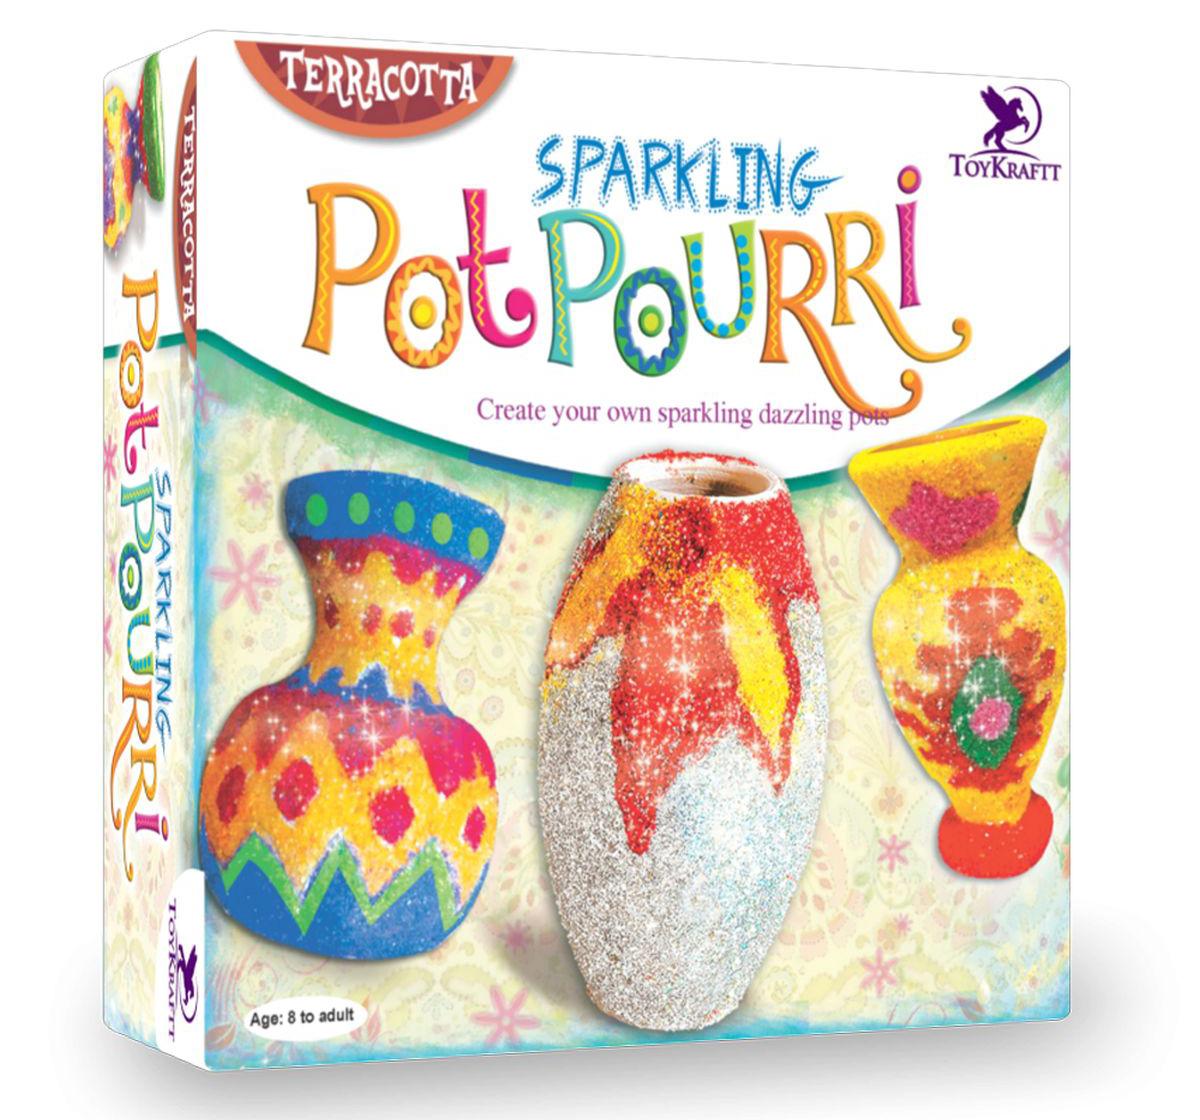 Toy Kraft | Toy Kraft Sparkling Pot Pourri DIY Art & Craft Kits for Kids age 8Y+